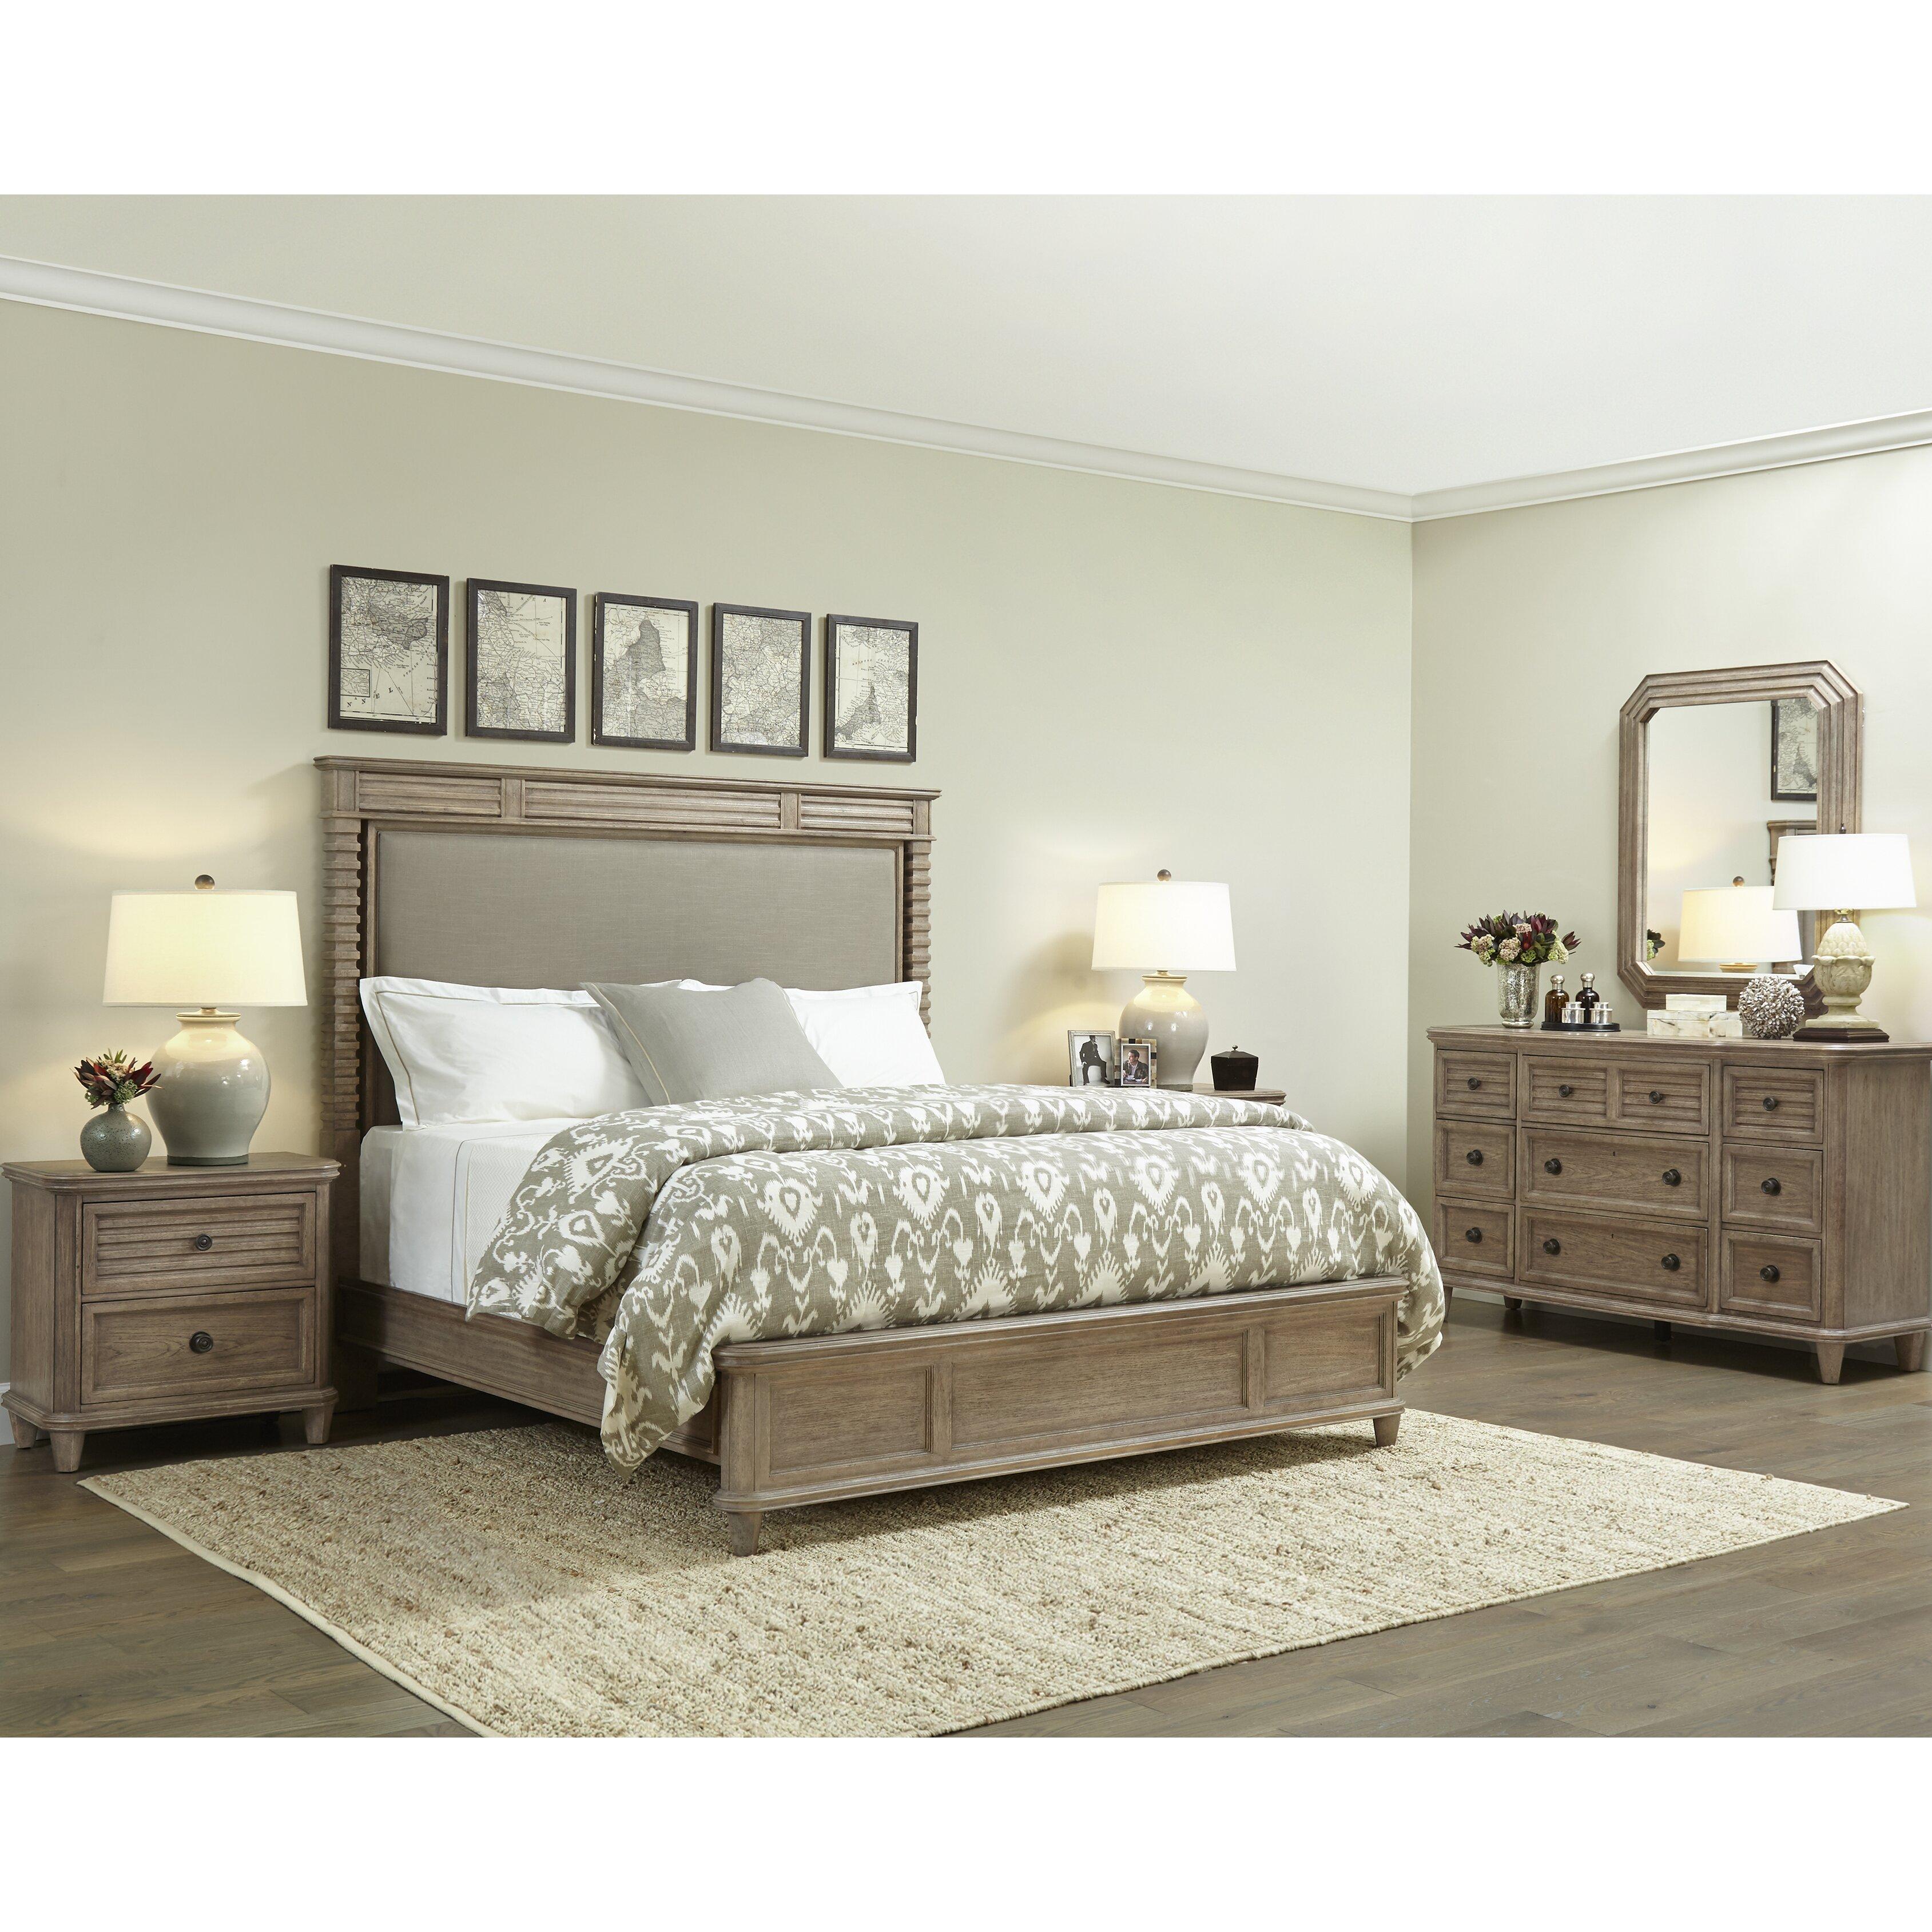 stanley furniture hadley panel customizable bedroom set